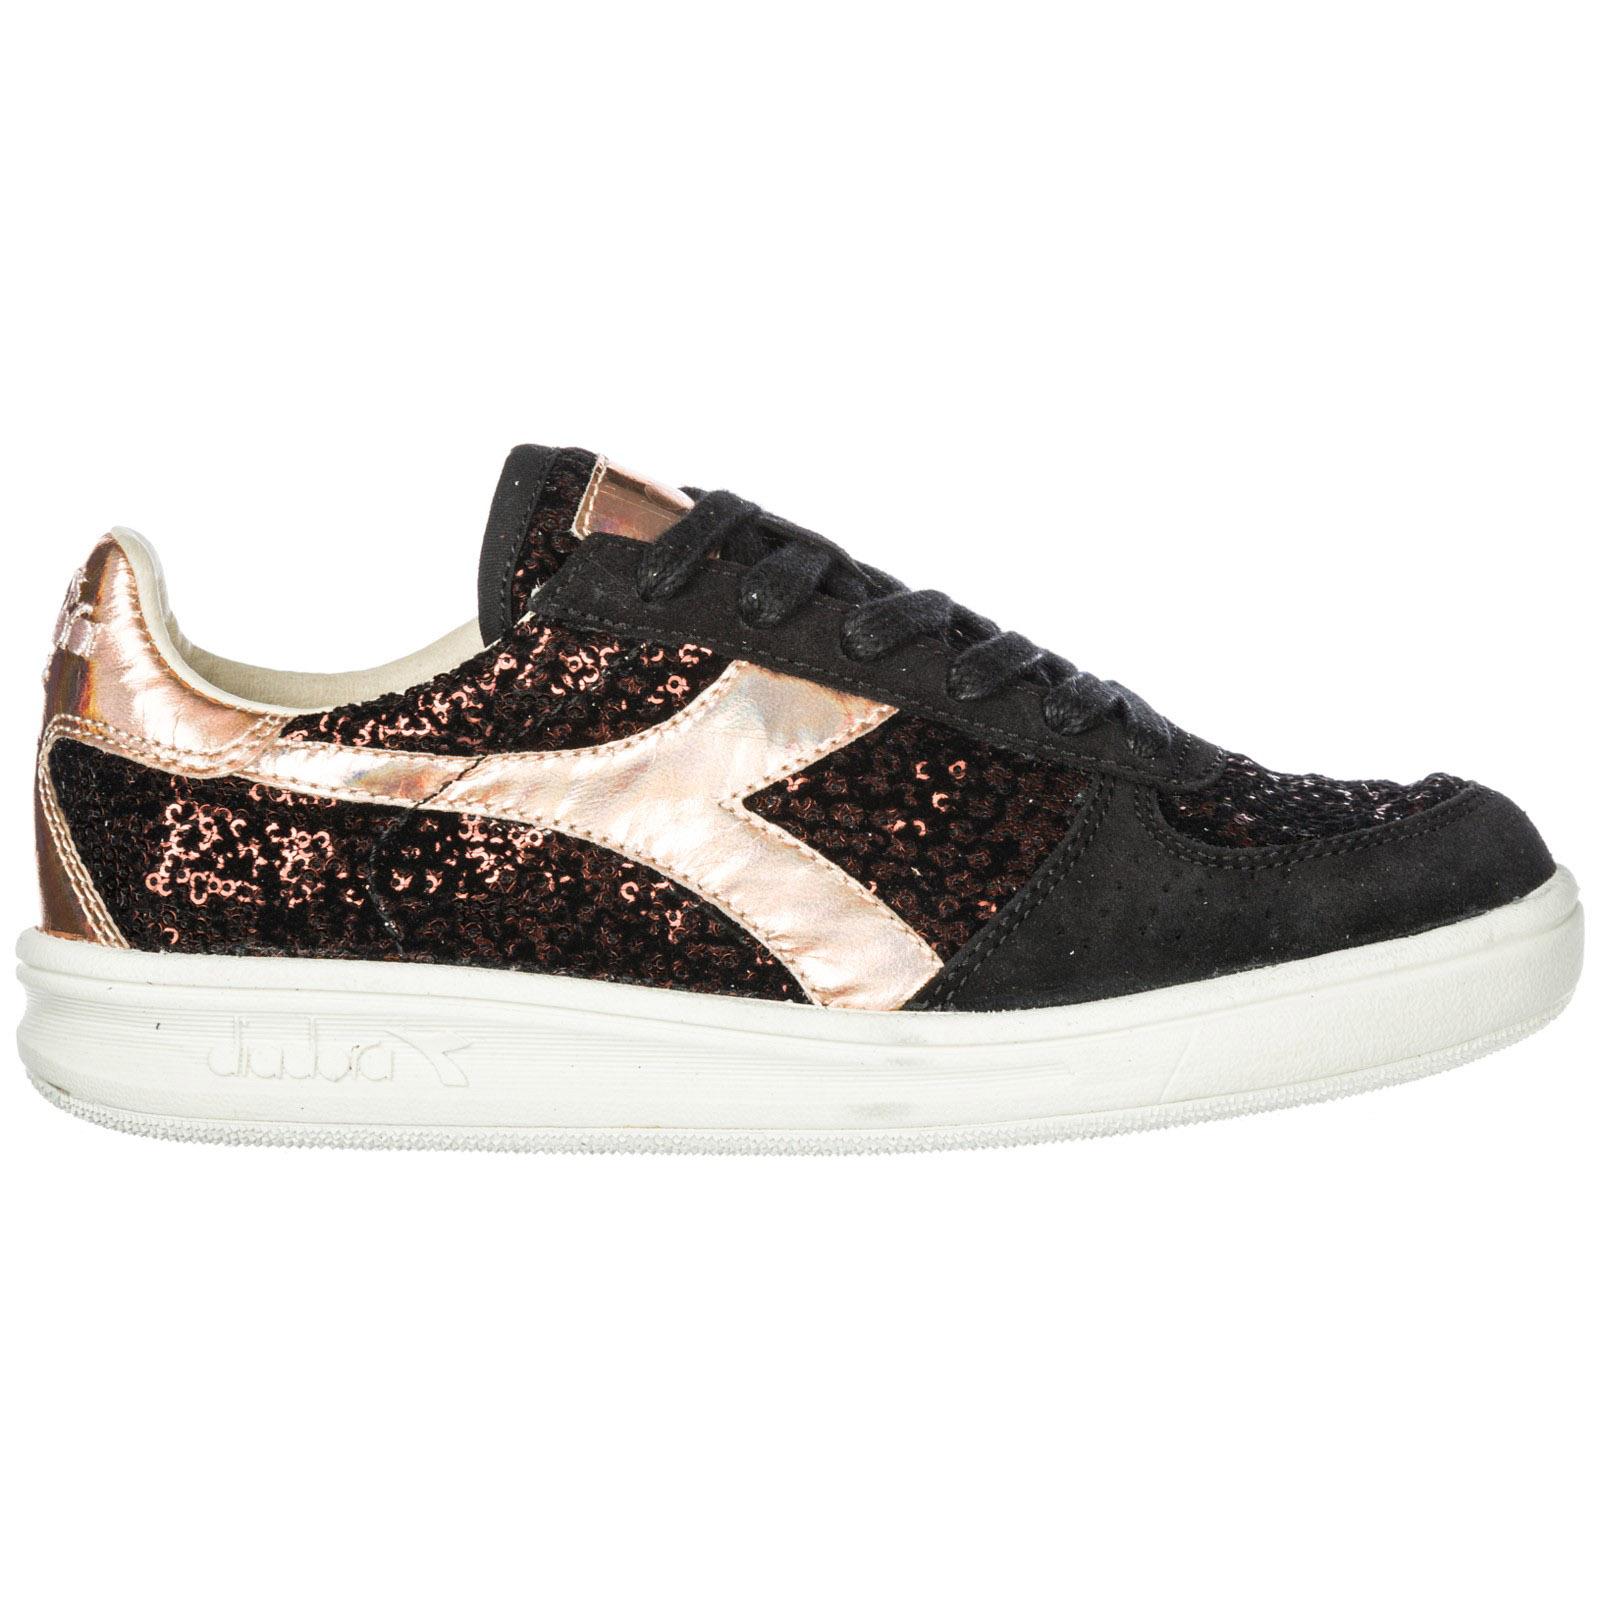 Scarpe sneakers donna in pelle b. elite